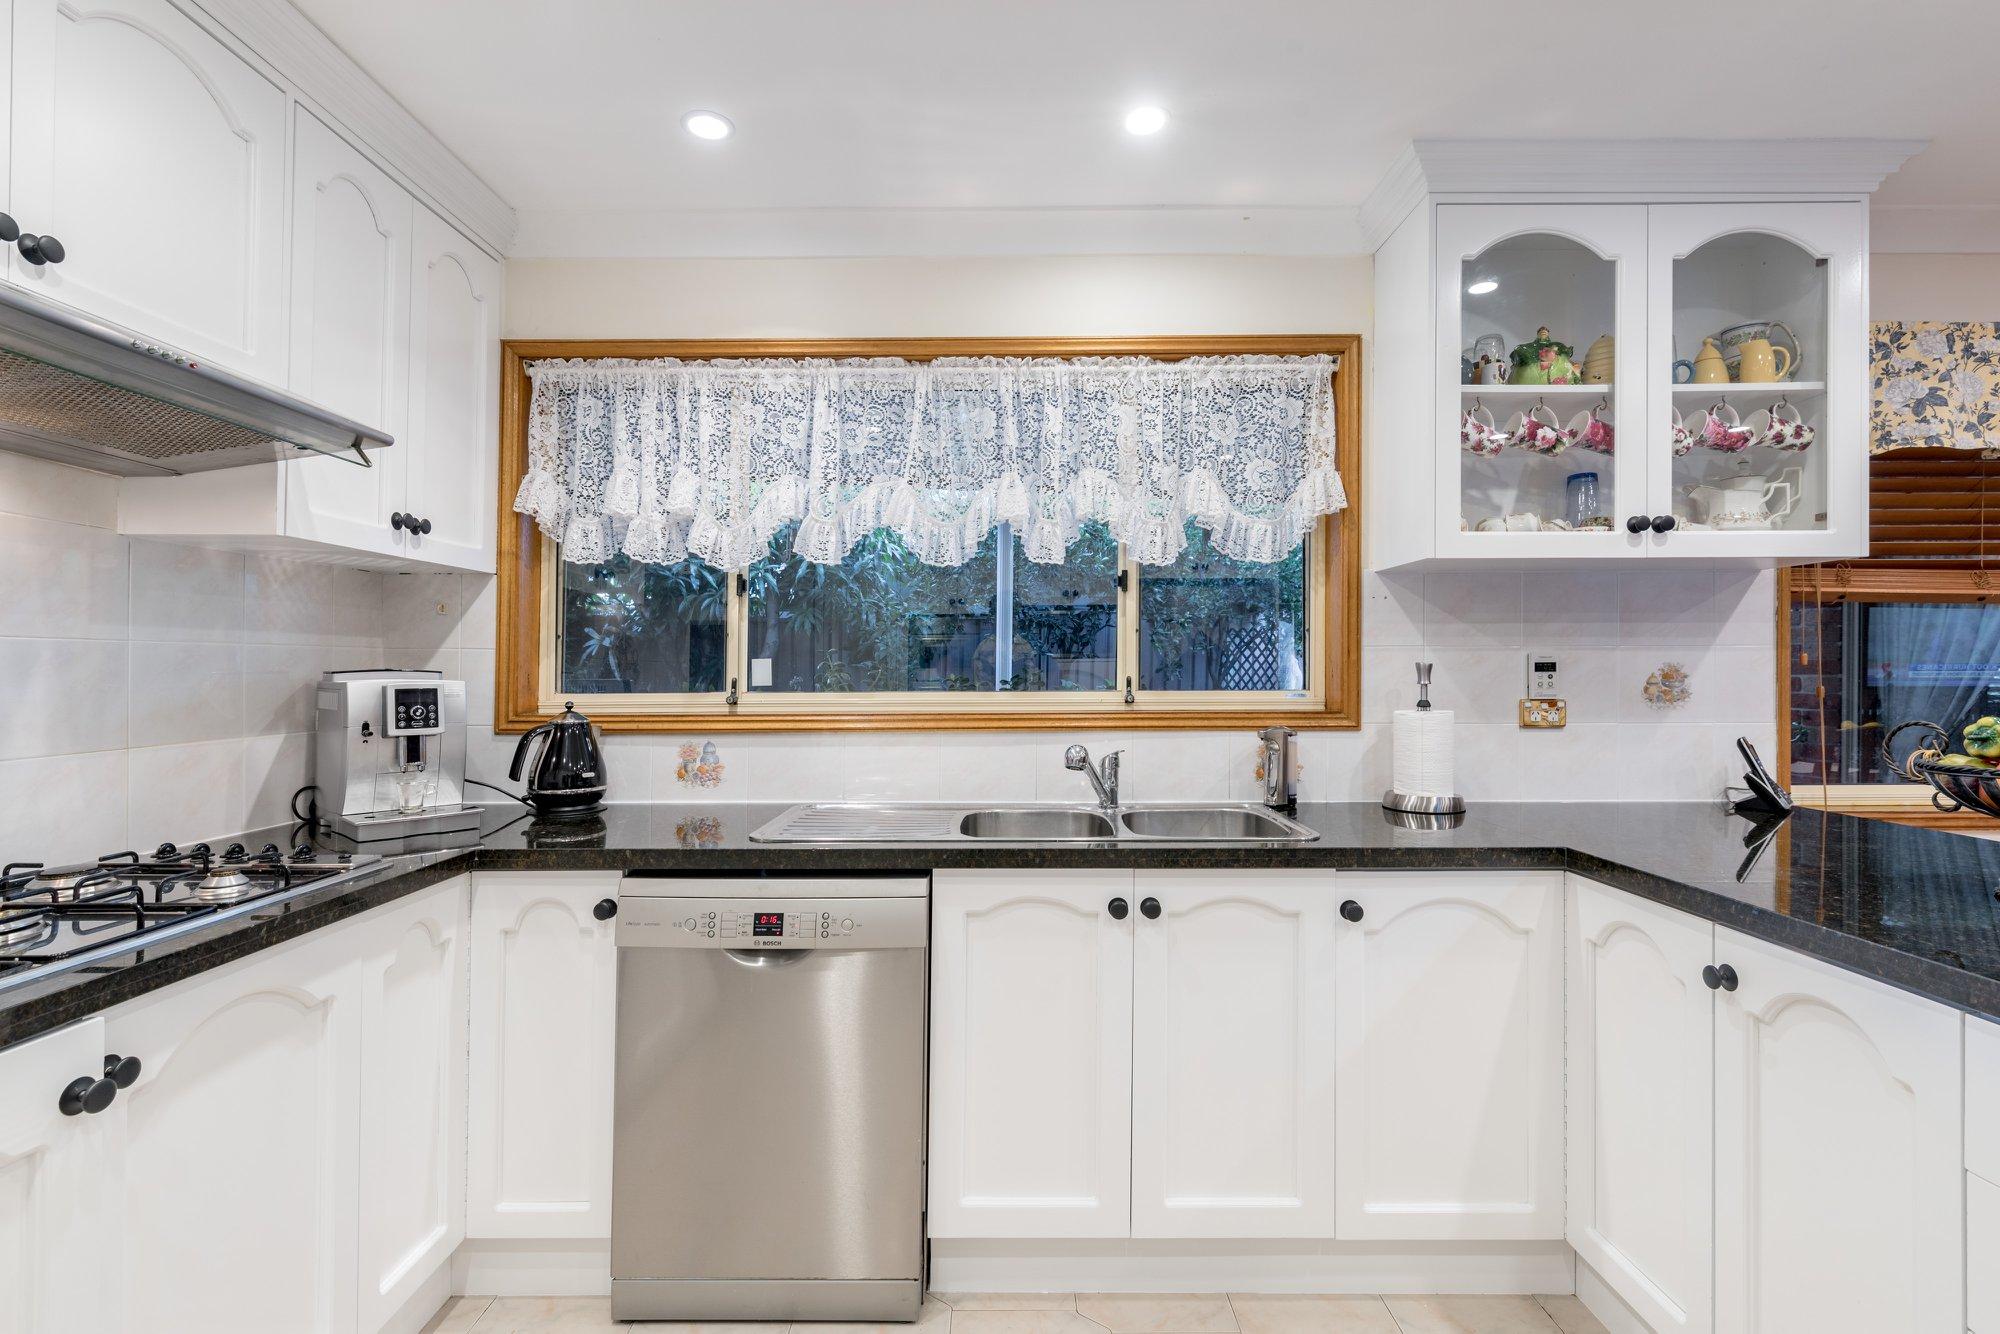 After - Perfect Kitchen Resurfacing